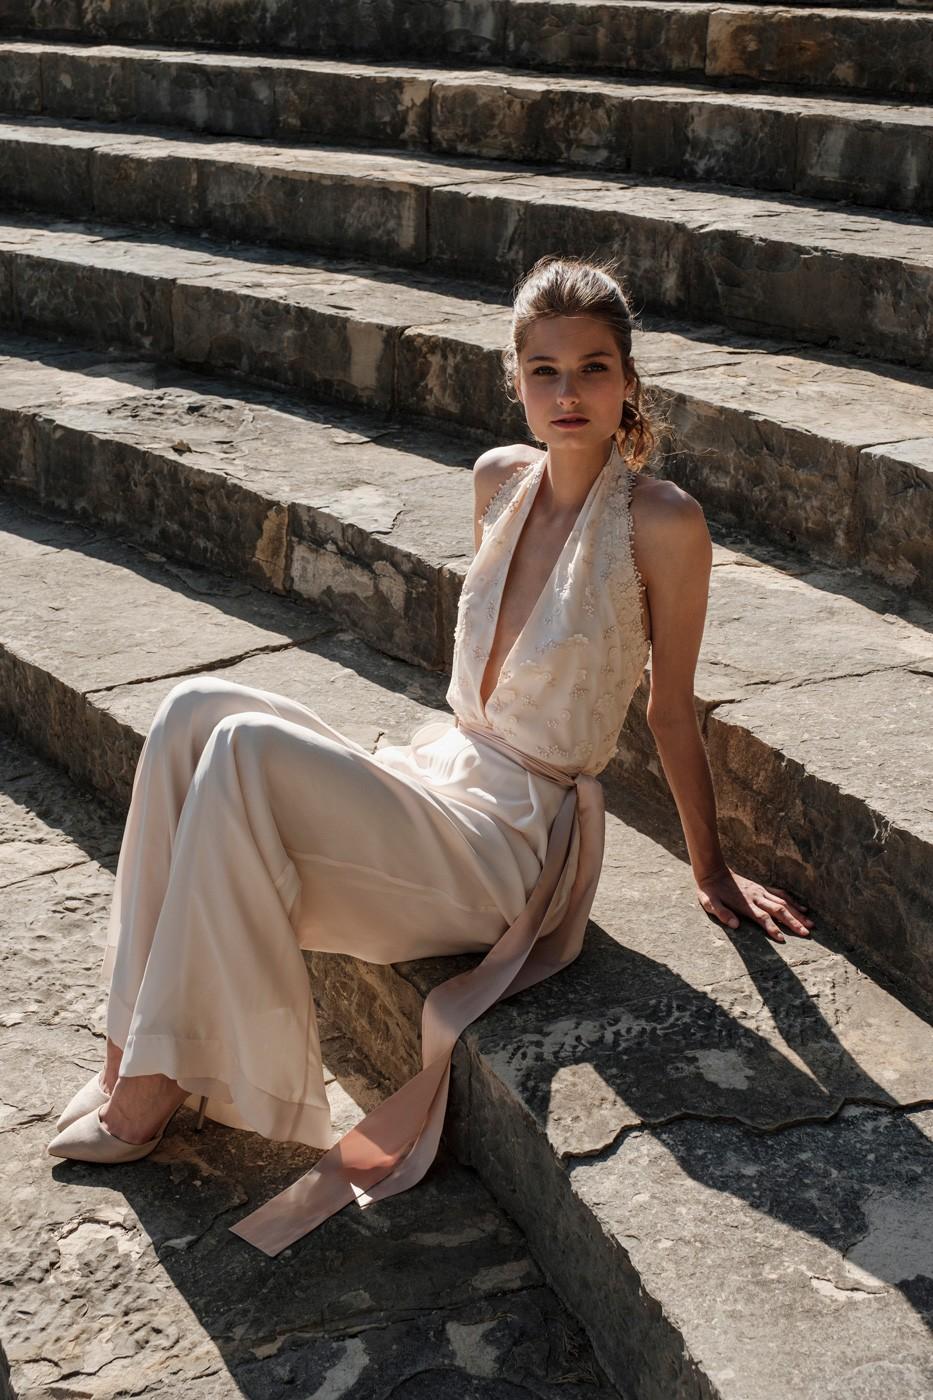 ELISA_NESS_Collection_2020_Moragne_01